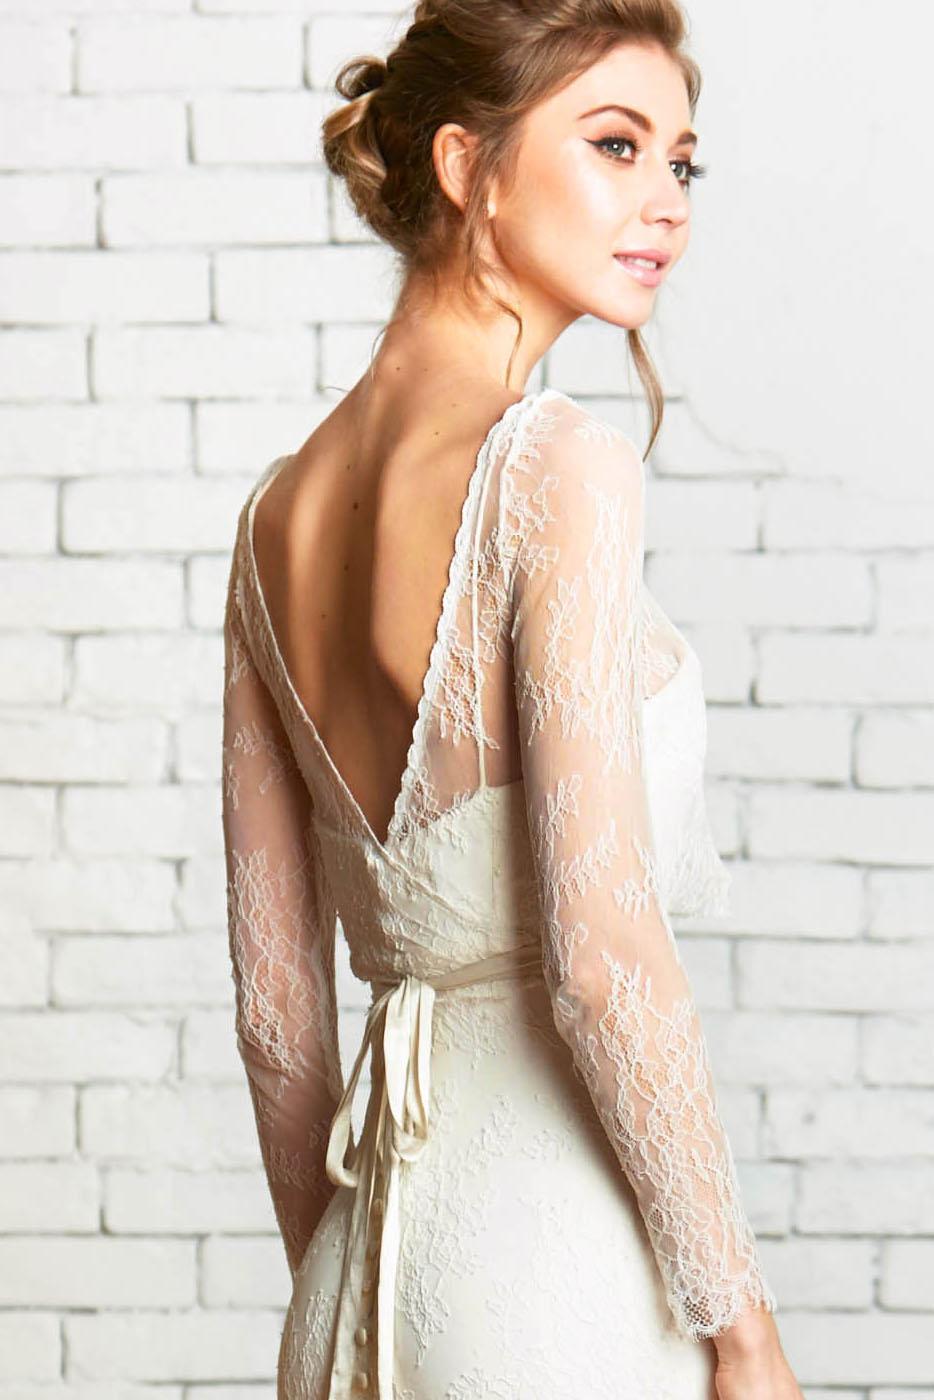 BrookeTop-Back-Ballet_Wrap_Long_Sleeve_Lace_Wedding_Separates.jpg